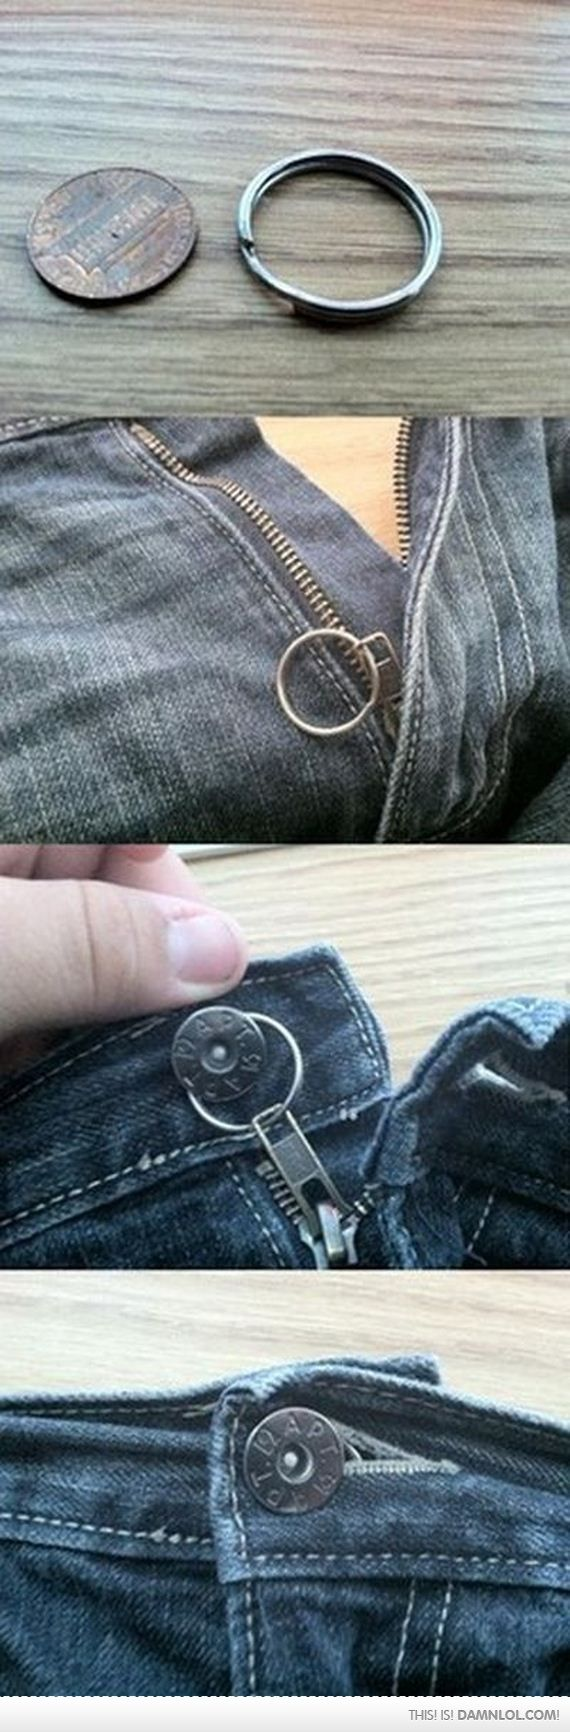 Zipper Keep Falling Down? Here's how to fix it!